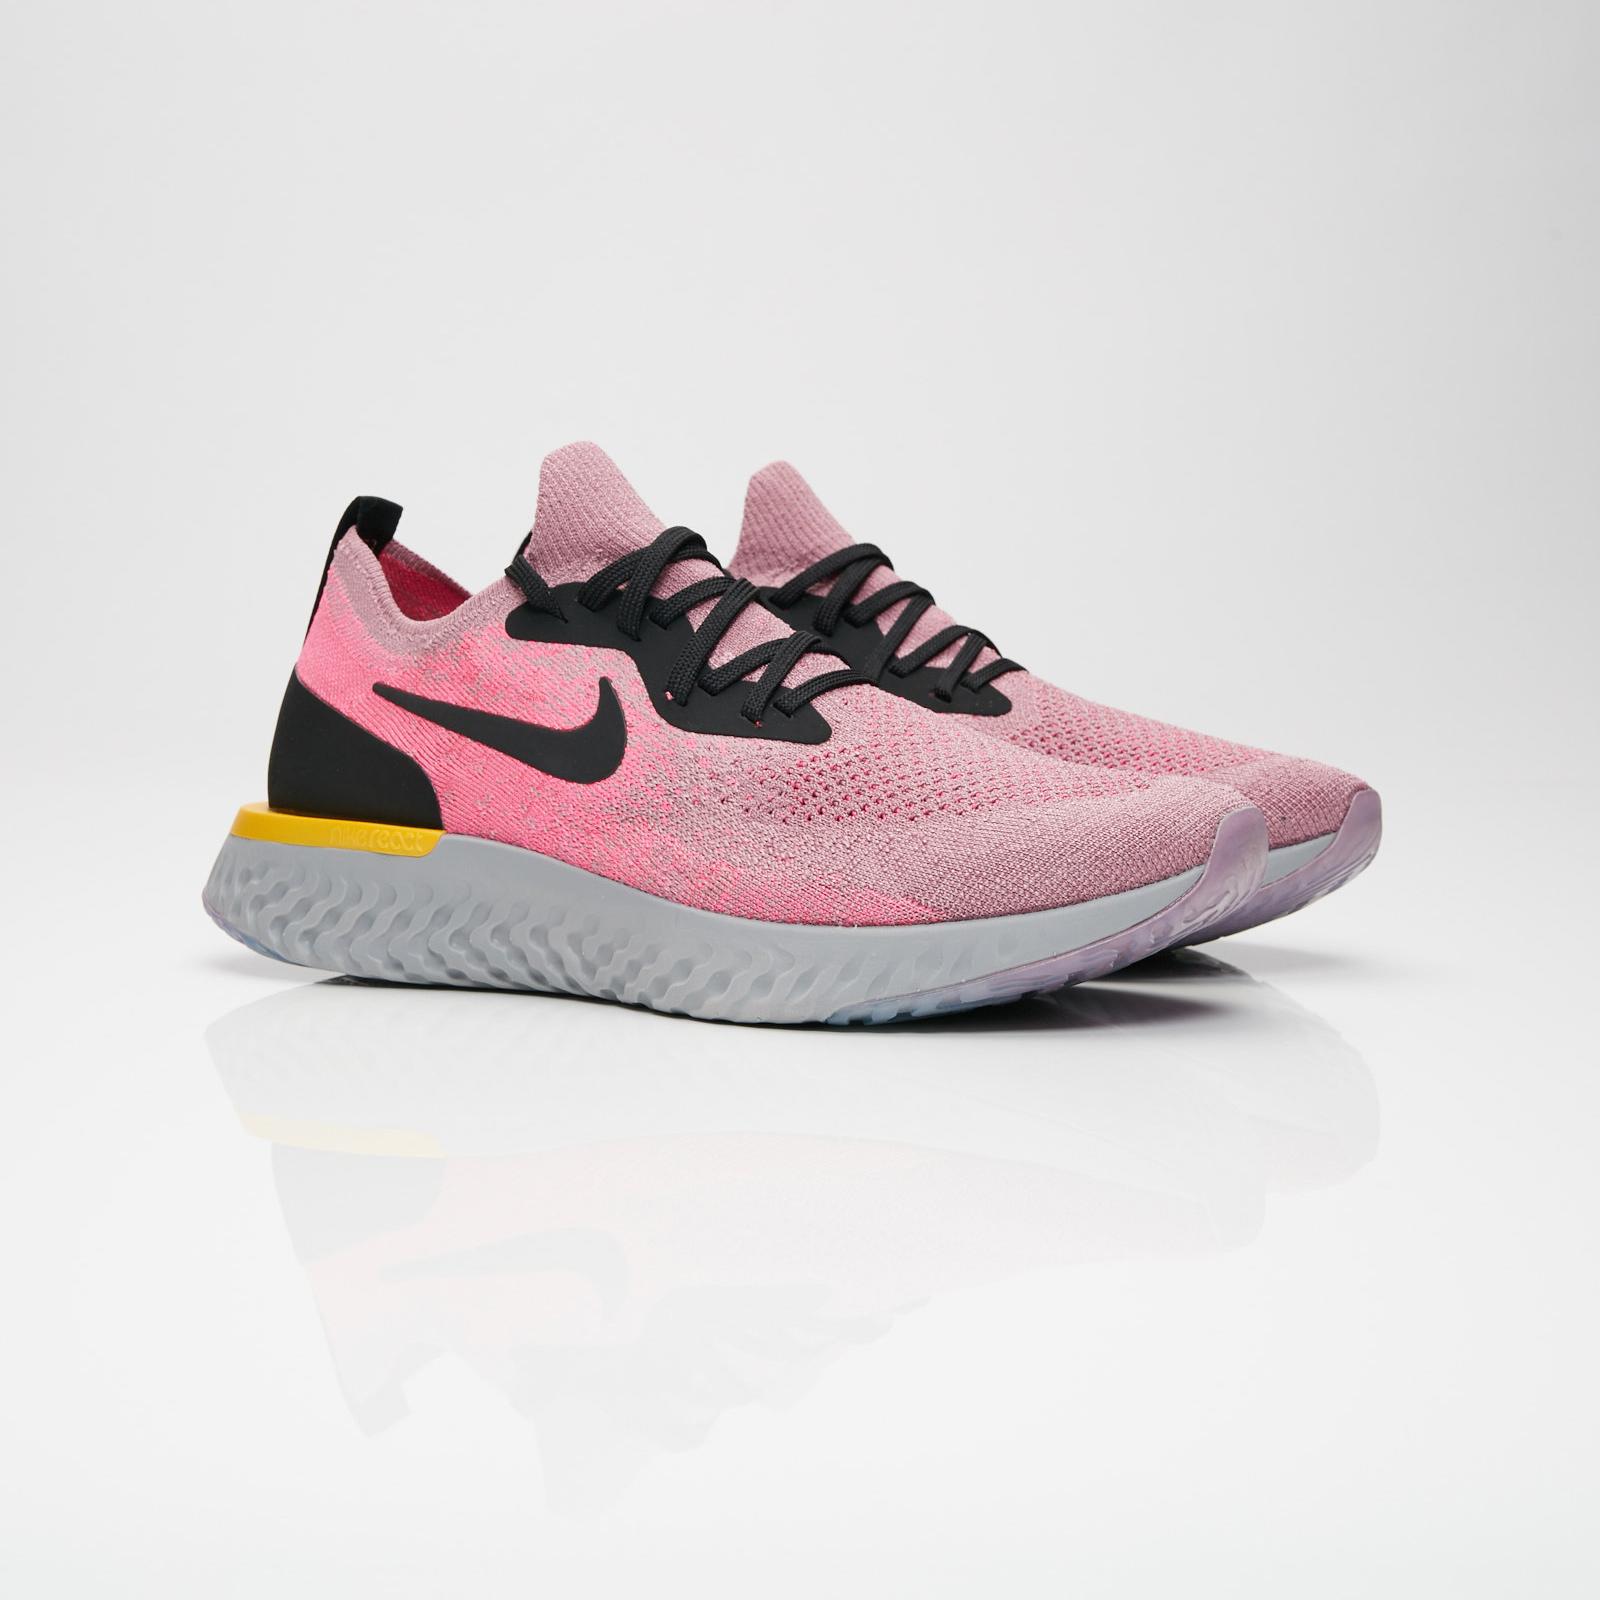 Nike Epic React Flyknit - Aq0067-500 - Sneakersnstuff  ef5818f2c051